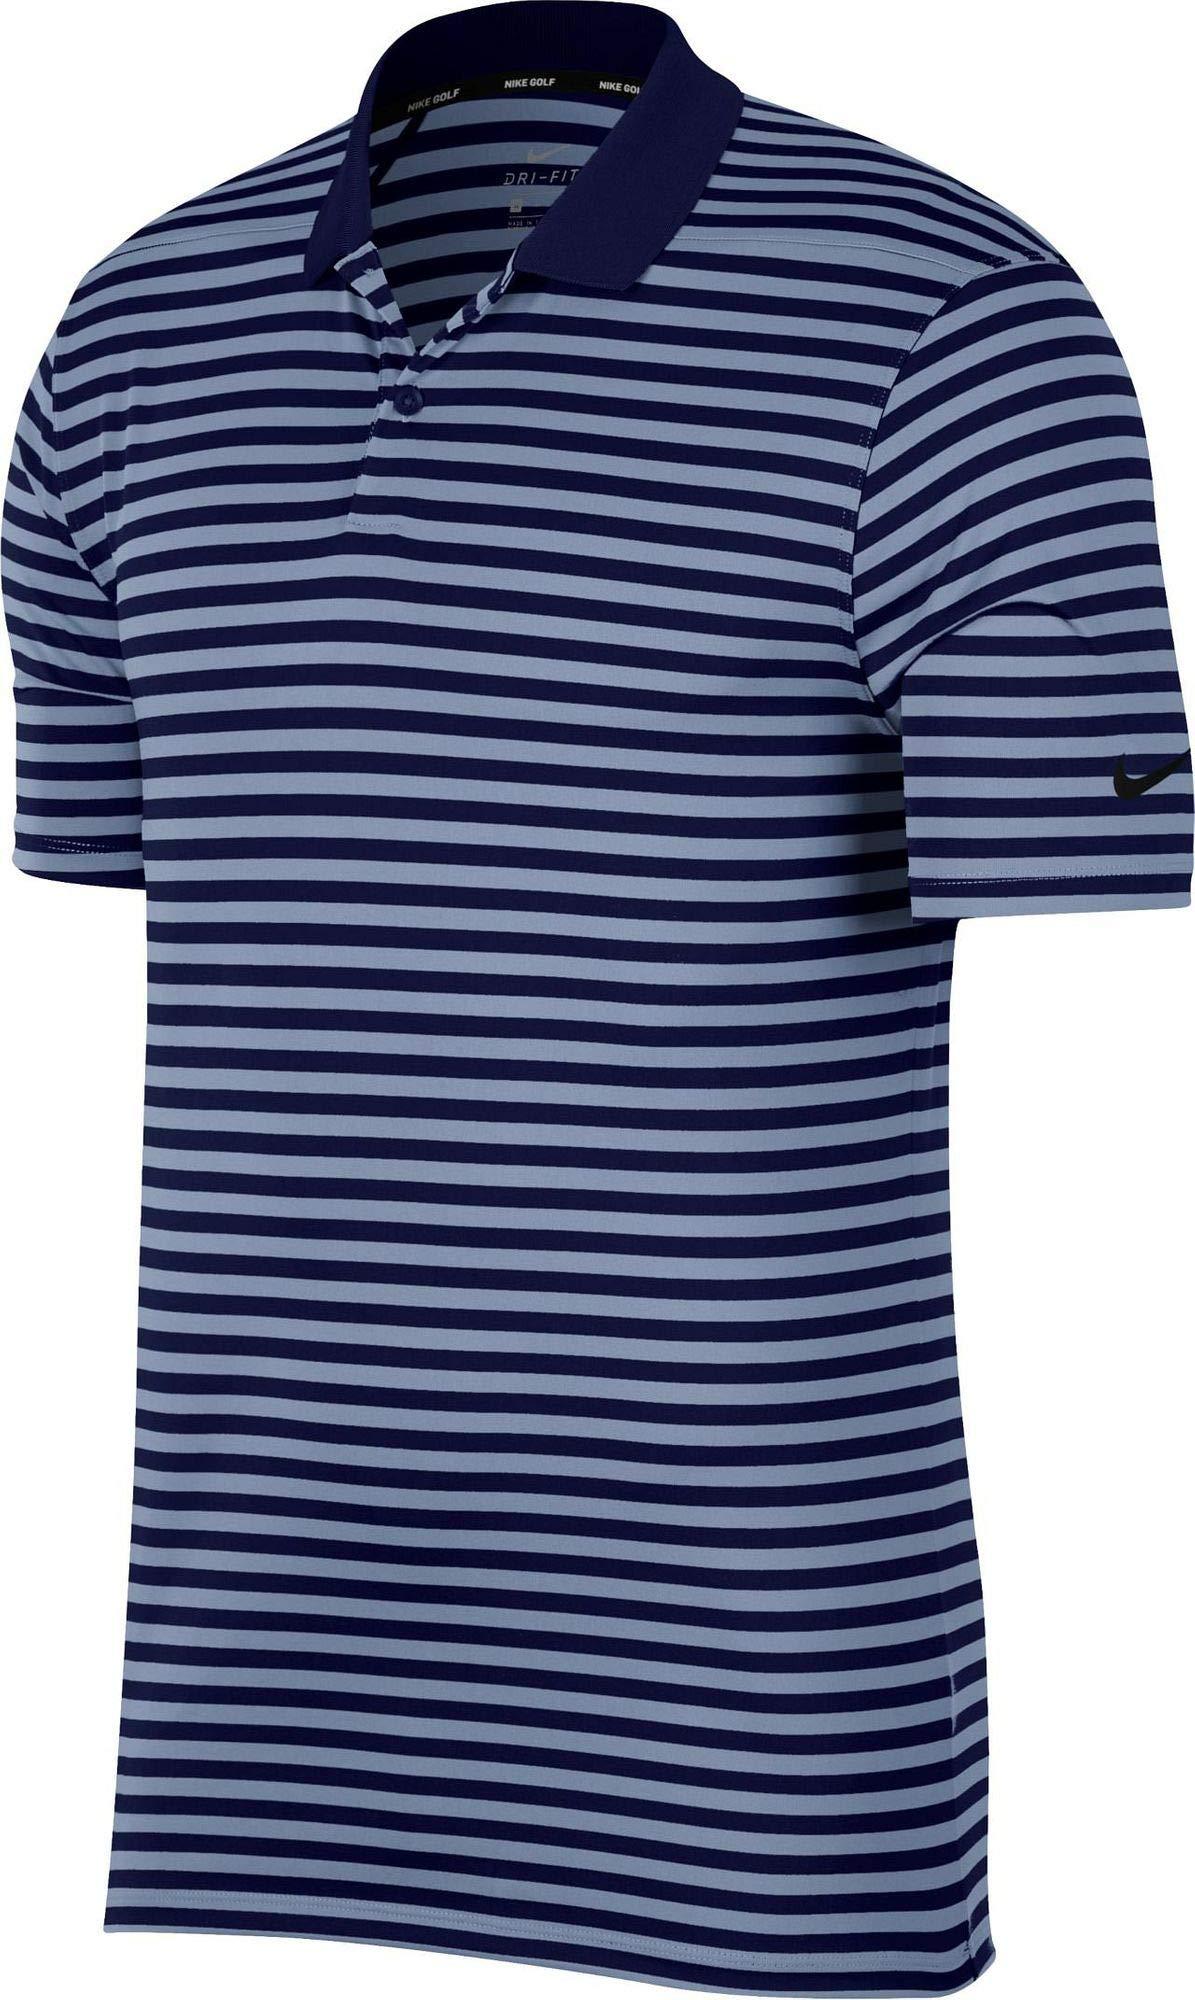 Nike Dri Fit Victory Stripe Golf Polo 2019 Blue Void/Indigo Fog/Black Small by Nike (Image #1)